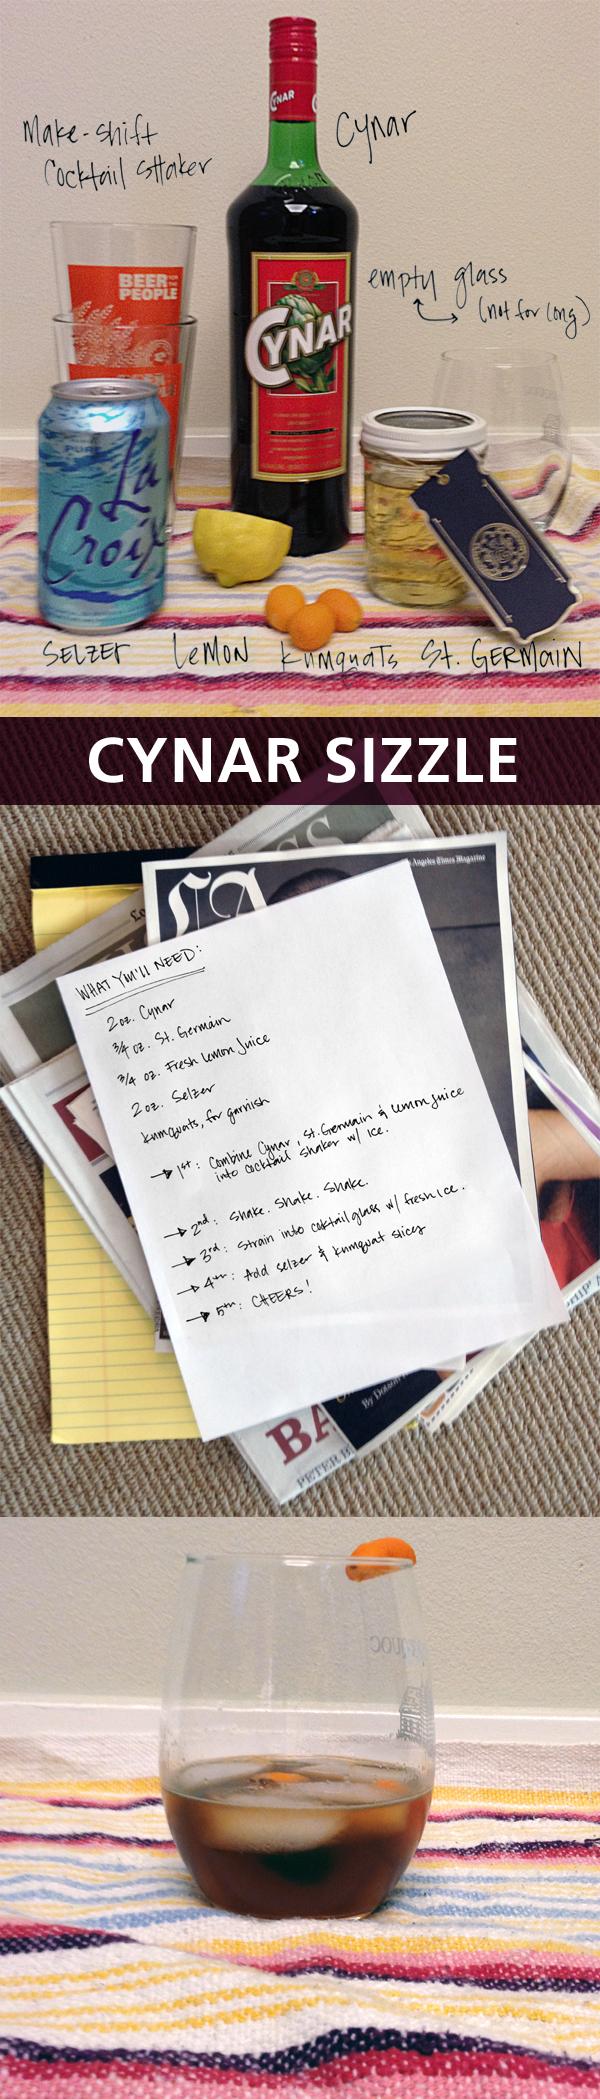 cynar-11.jpg